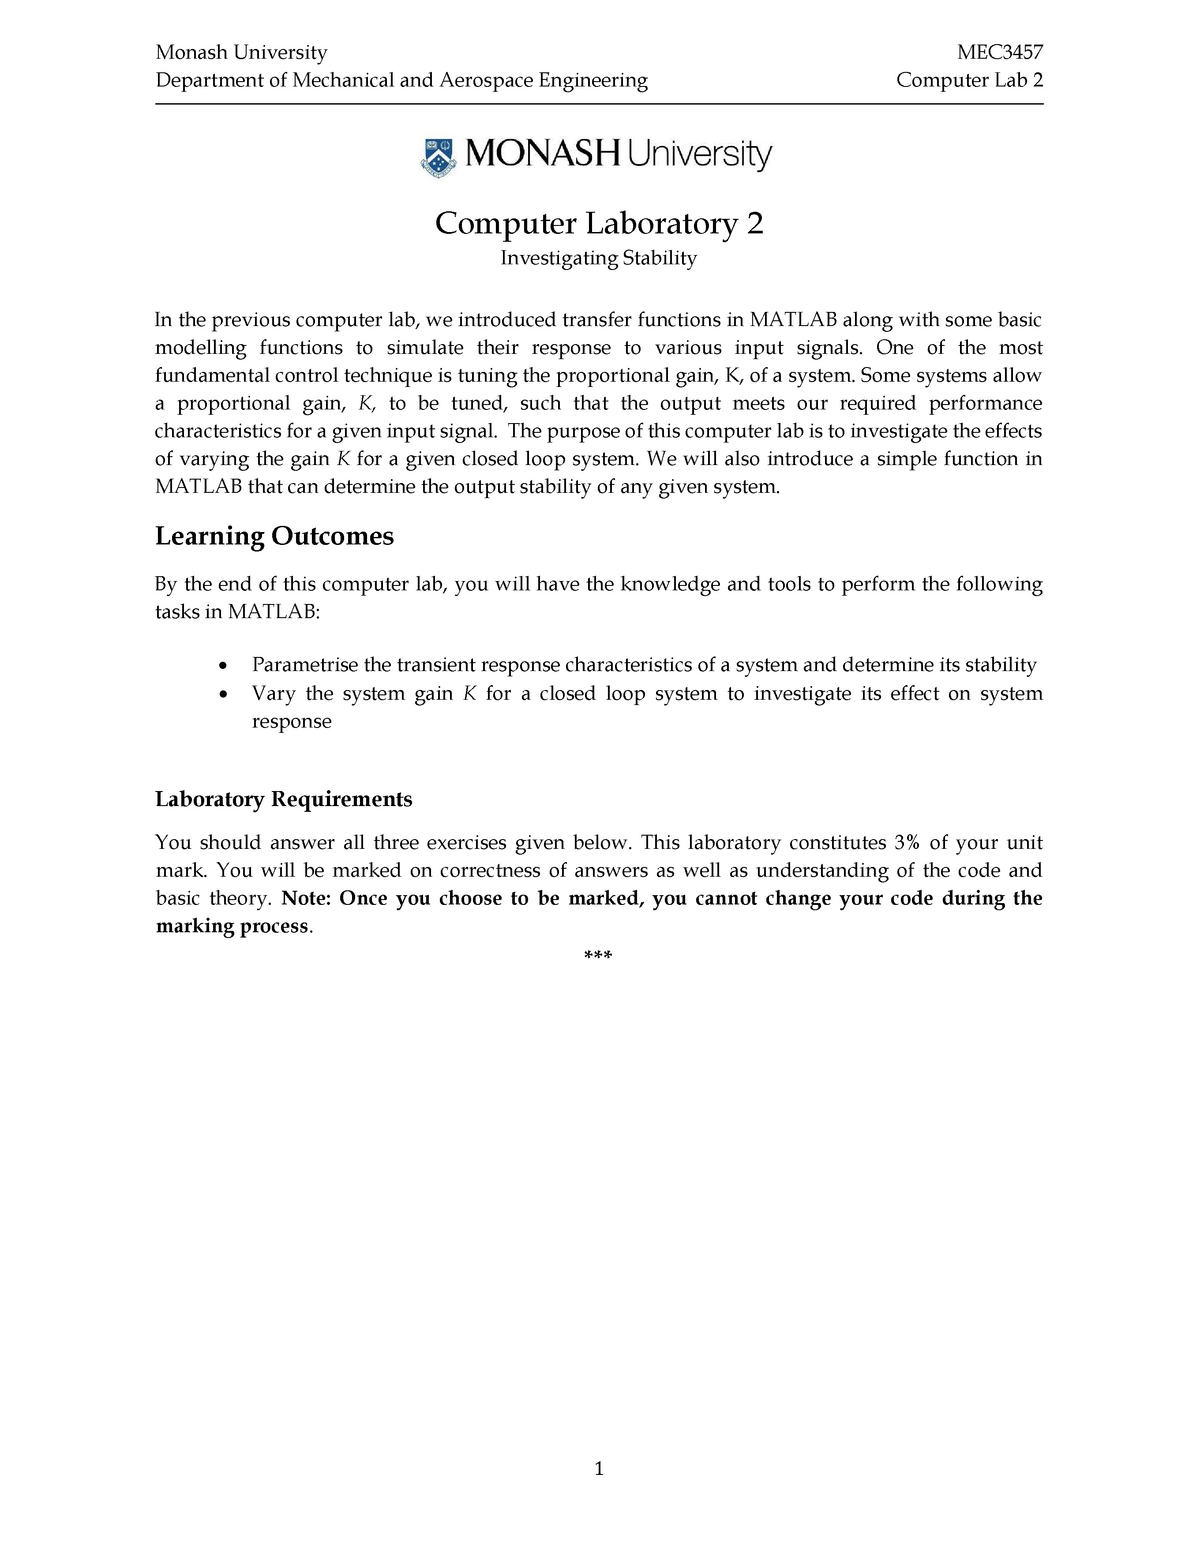 MEC3457 Computer Lab 2 - MEC3457: Systems And Control - StuDocu